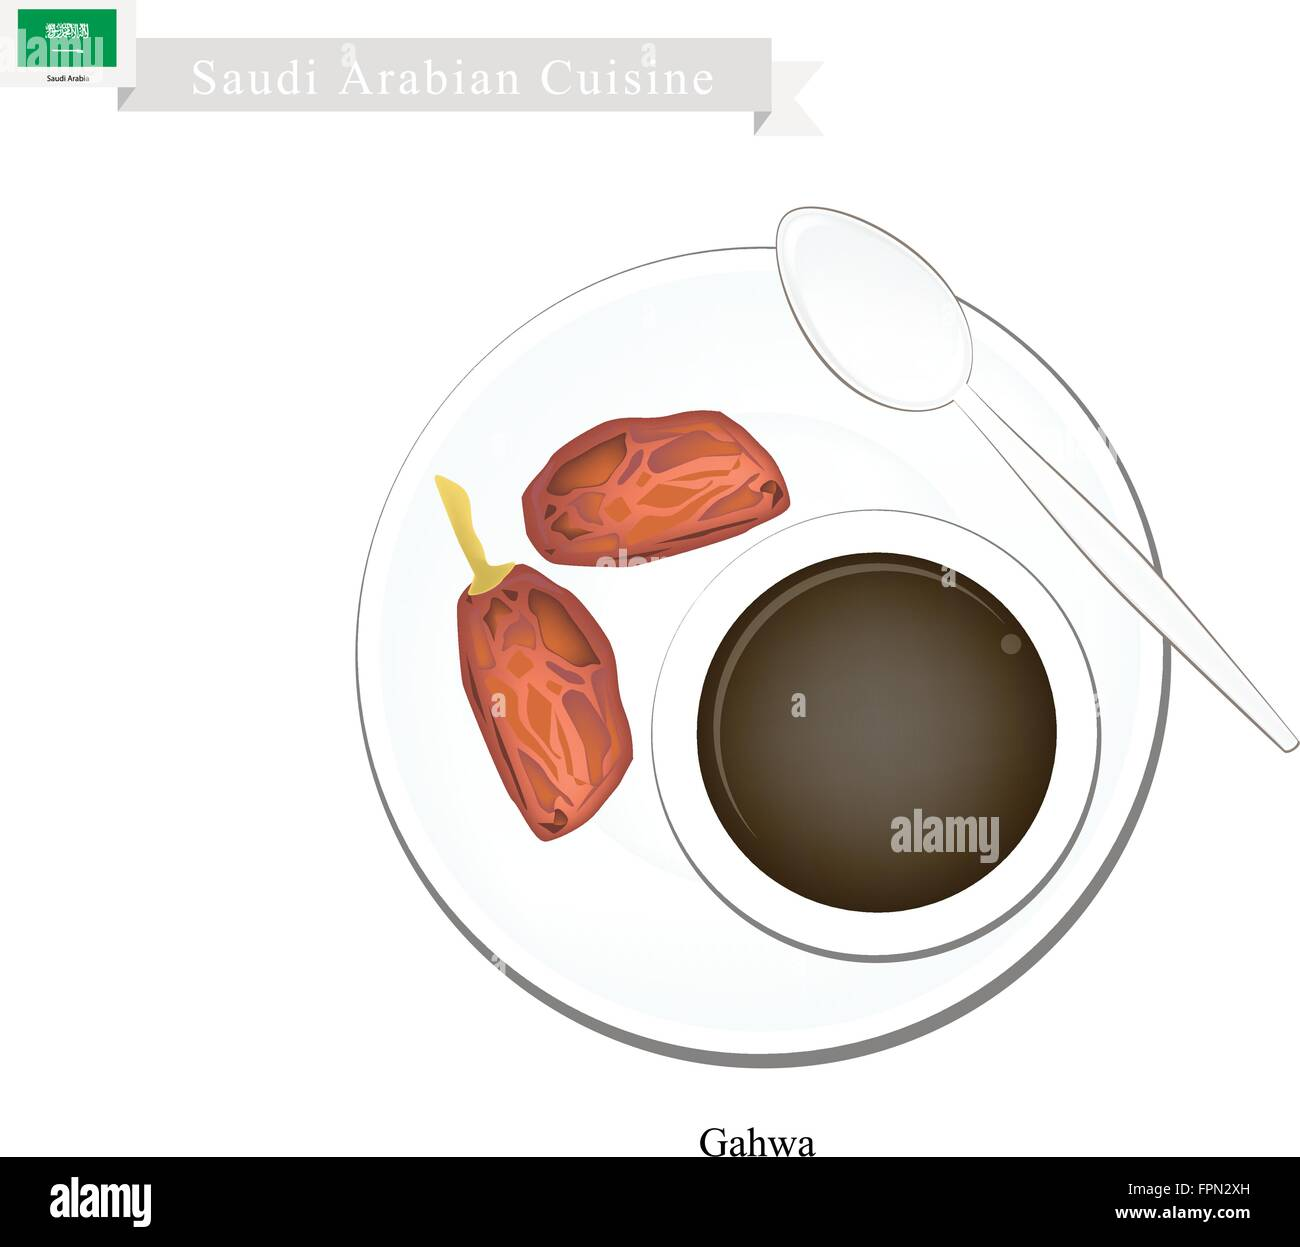 Saudi Arabian Cuisine, Arabic Coffee or Coffee Brewed from Dark Roast Coffee Beans Spiced with Cardamom. A Popular - Stock Vector